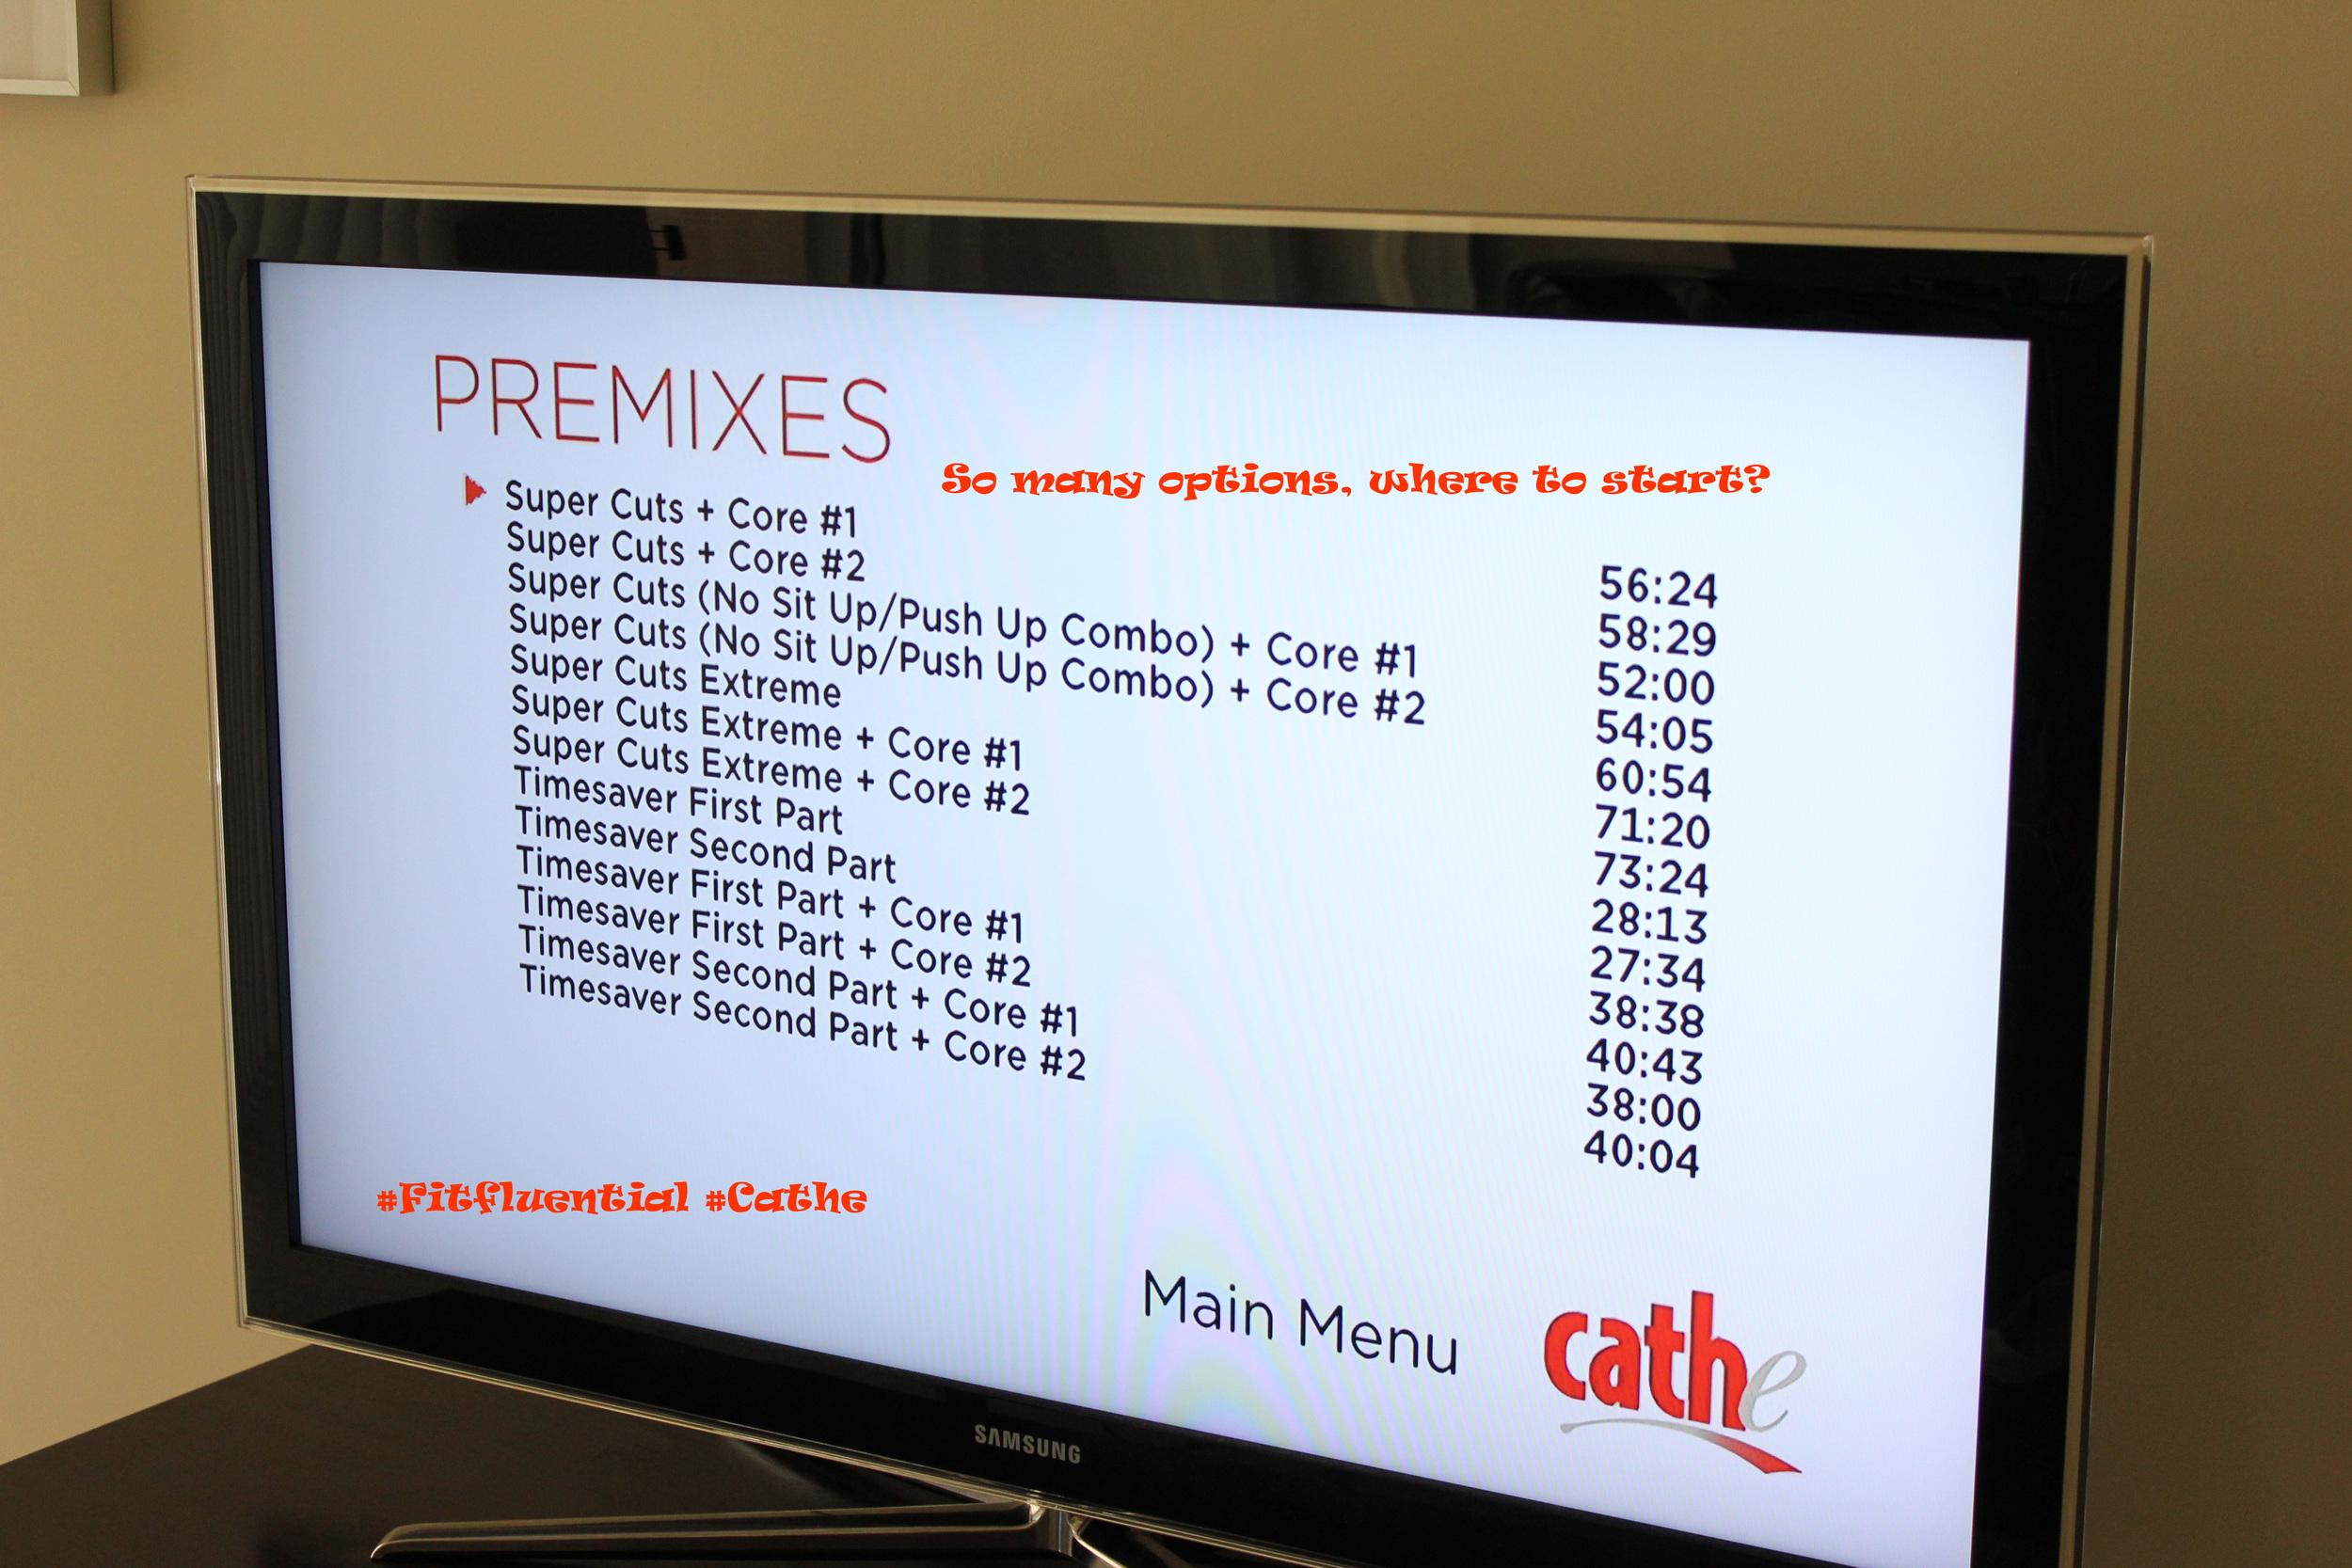 The Prefix menu